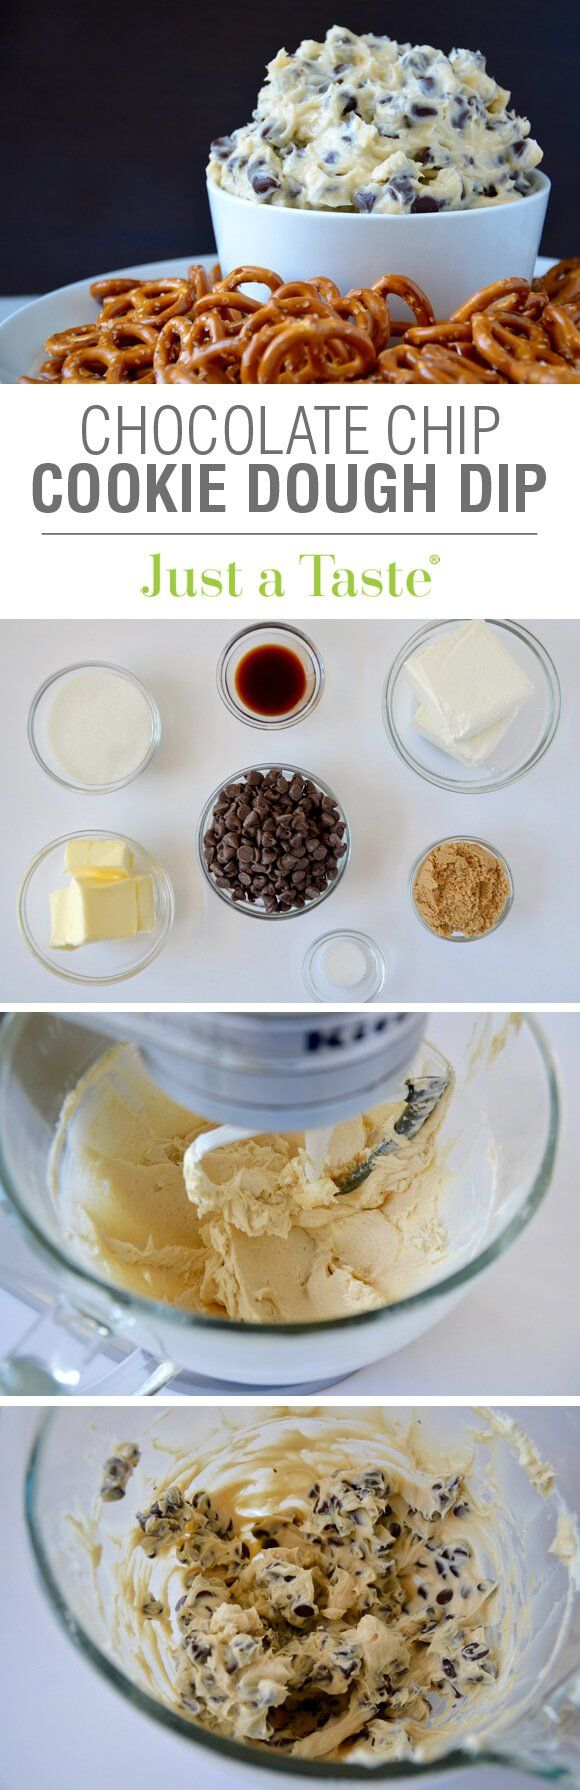 Chocolate Chip Cookie Dough Dip Recipe